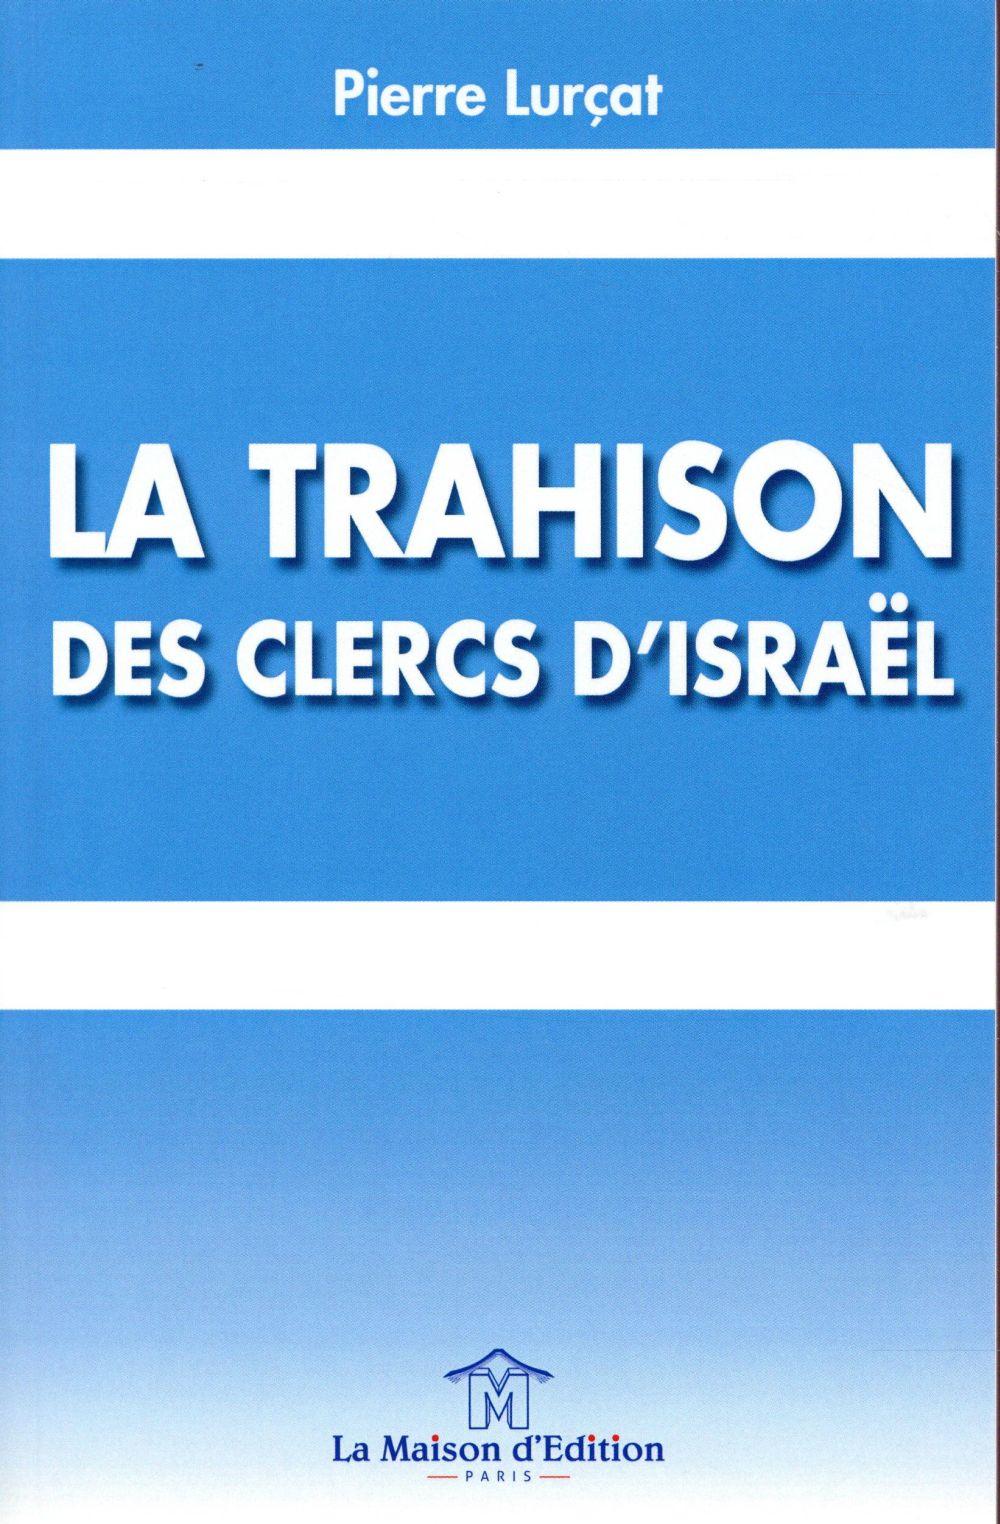 LA TRAHISON DES CLERCS D ISRAEL